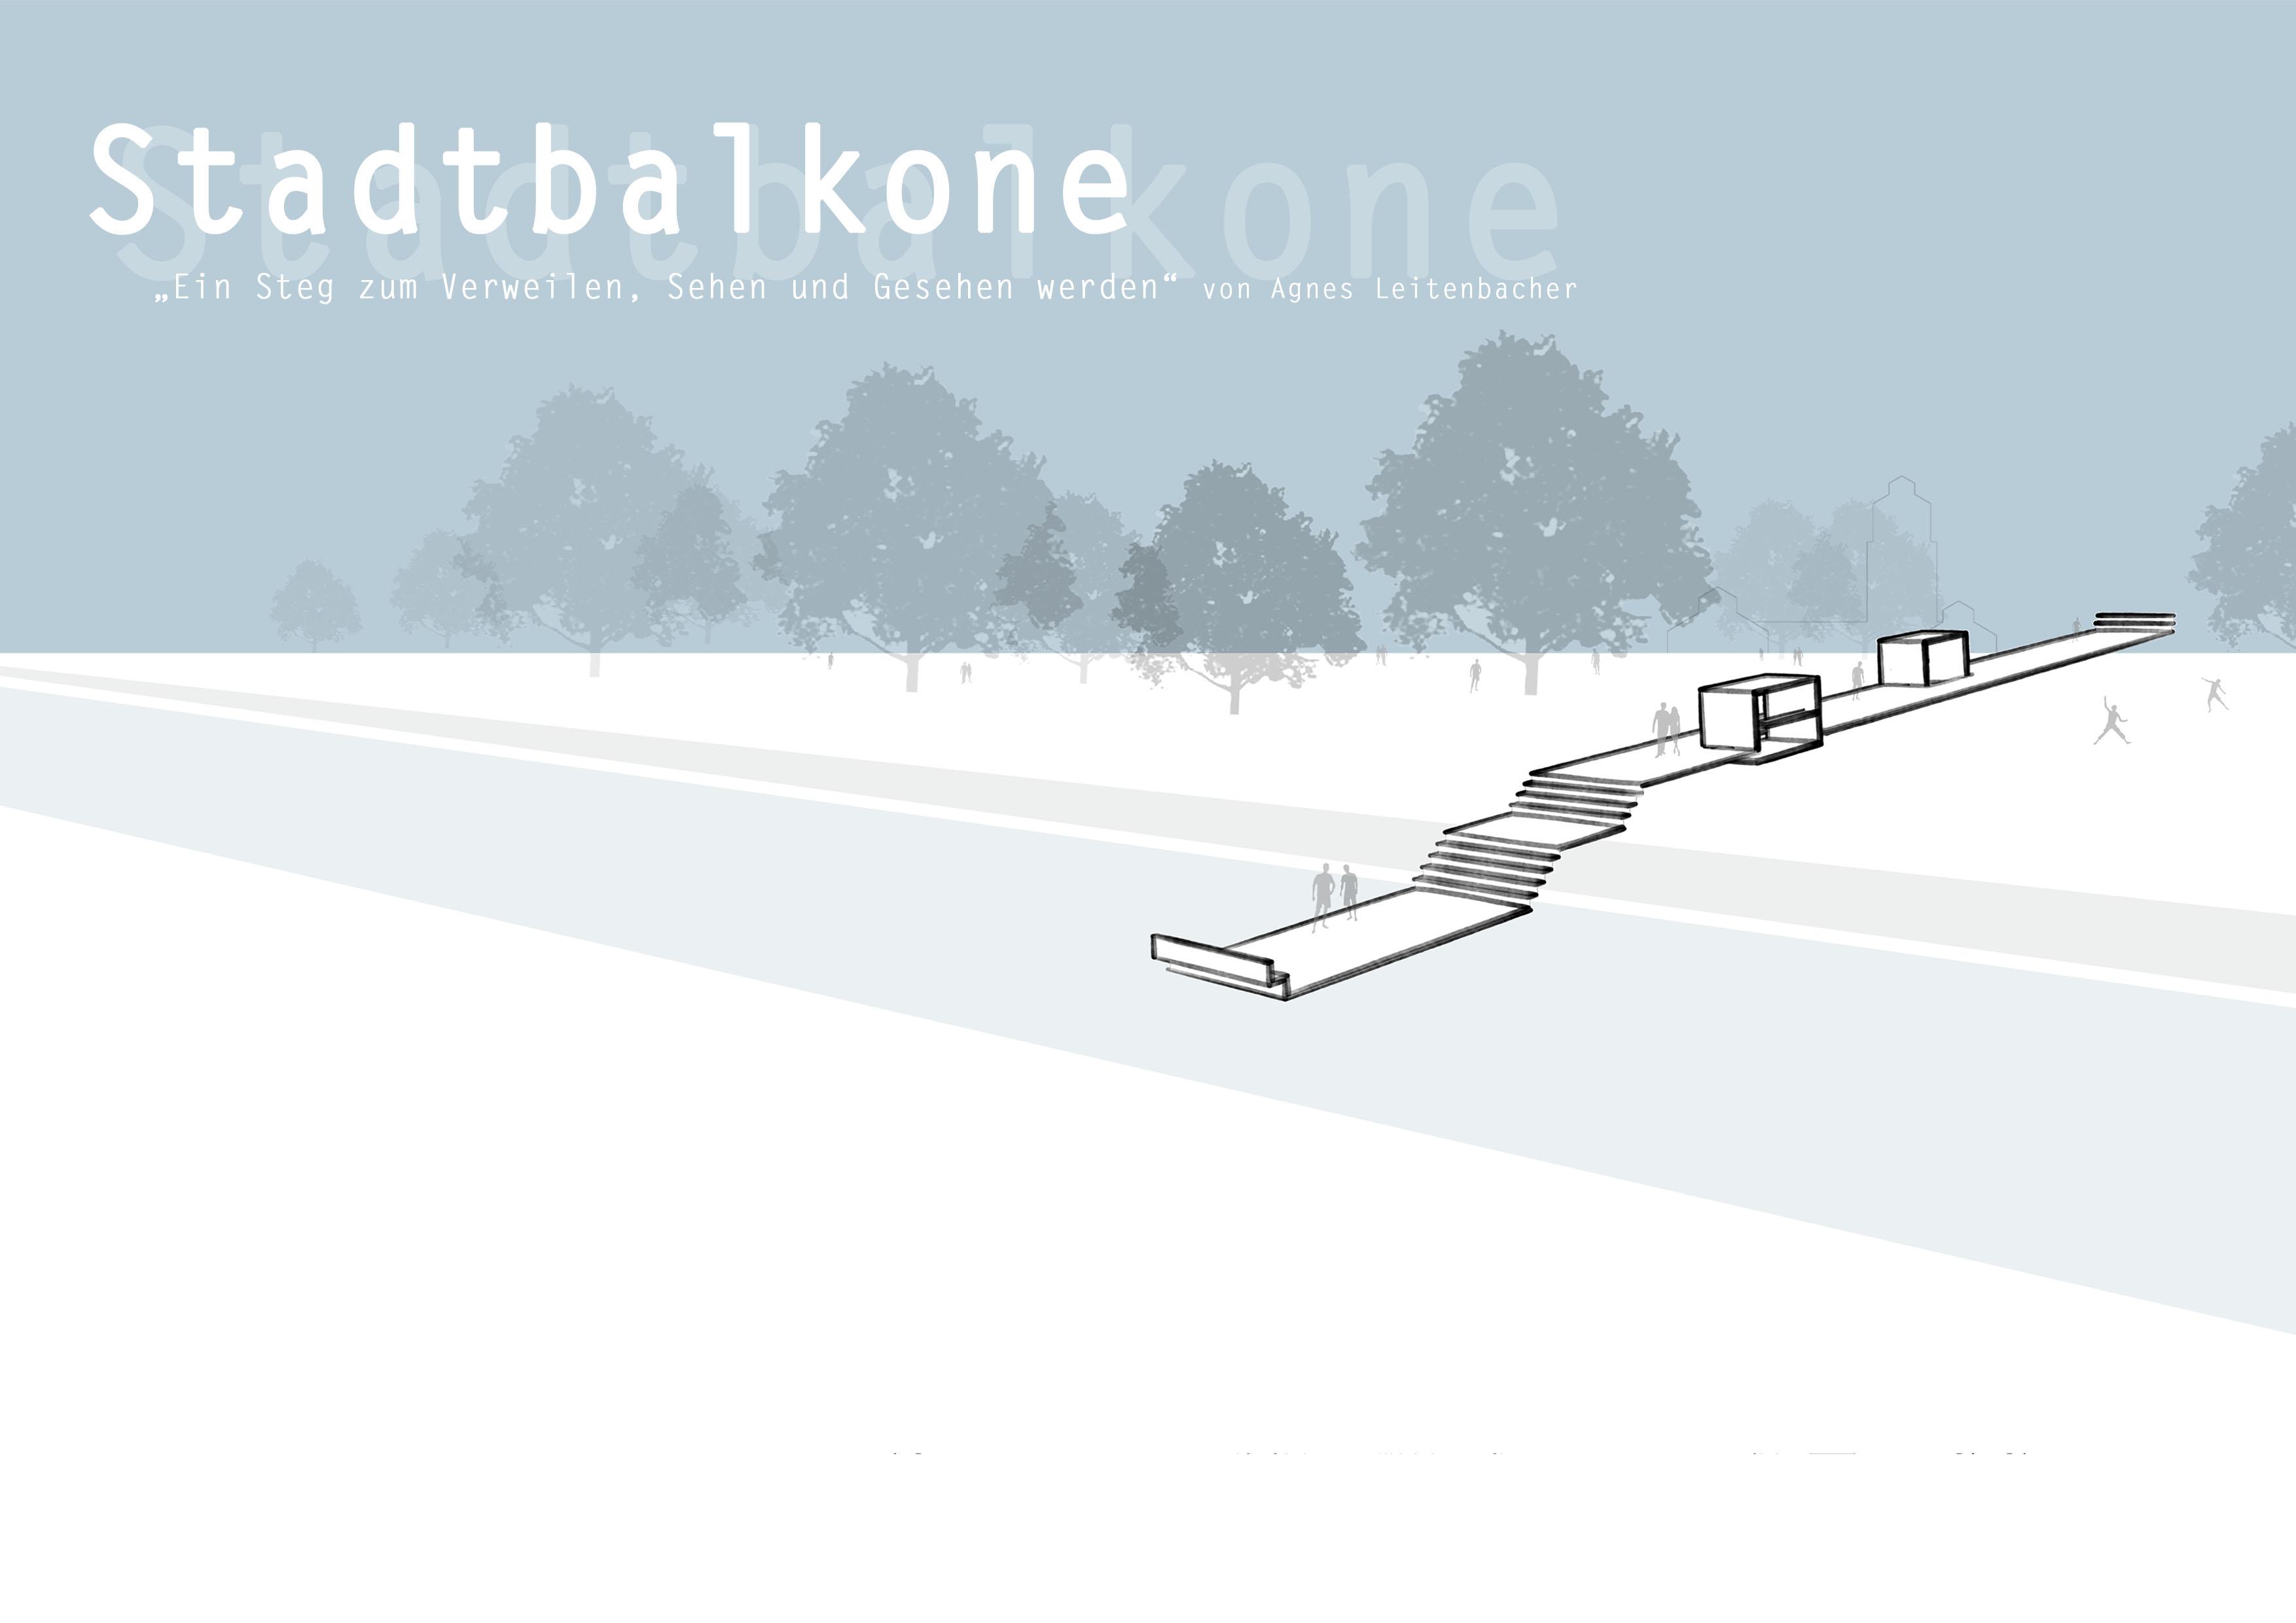 7_1_stadtbalkone_montage_agnes_leitenbacher